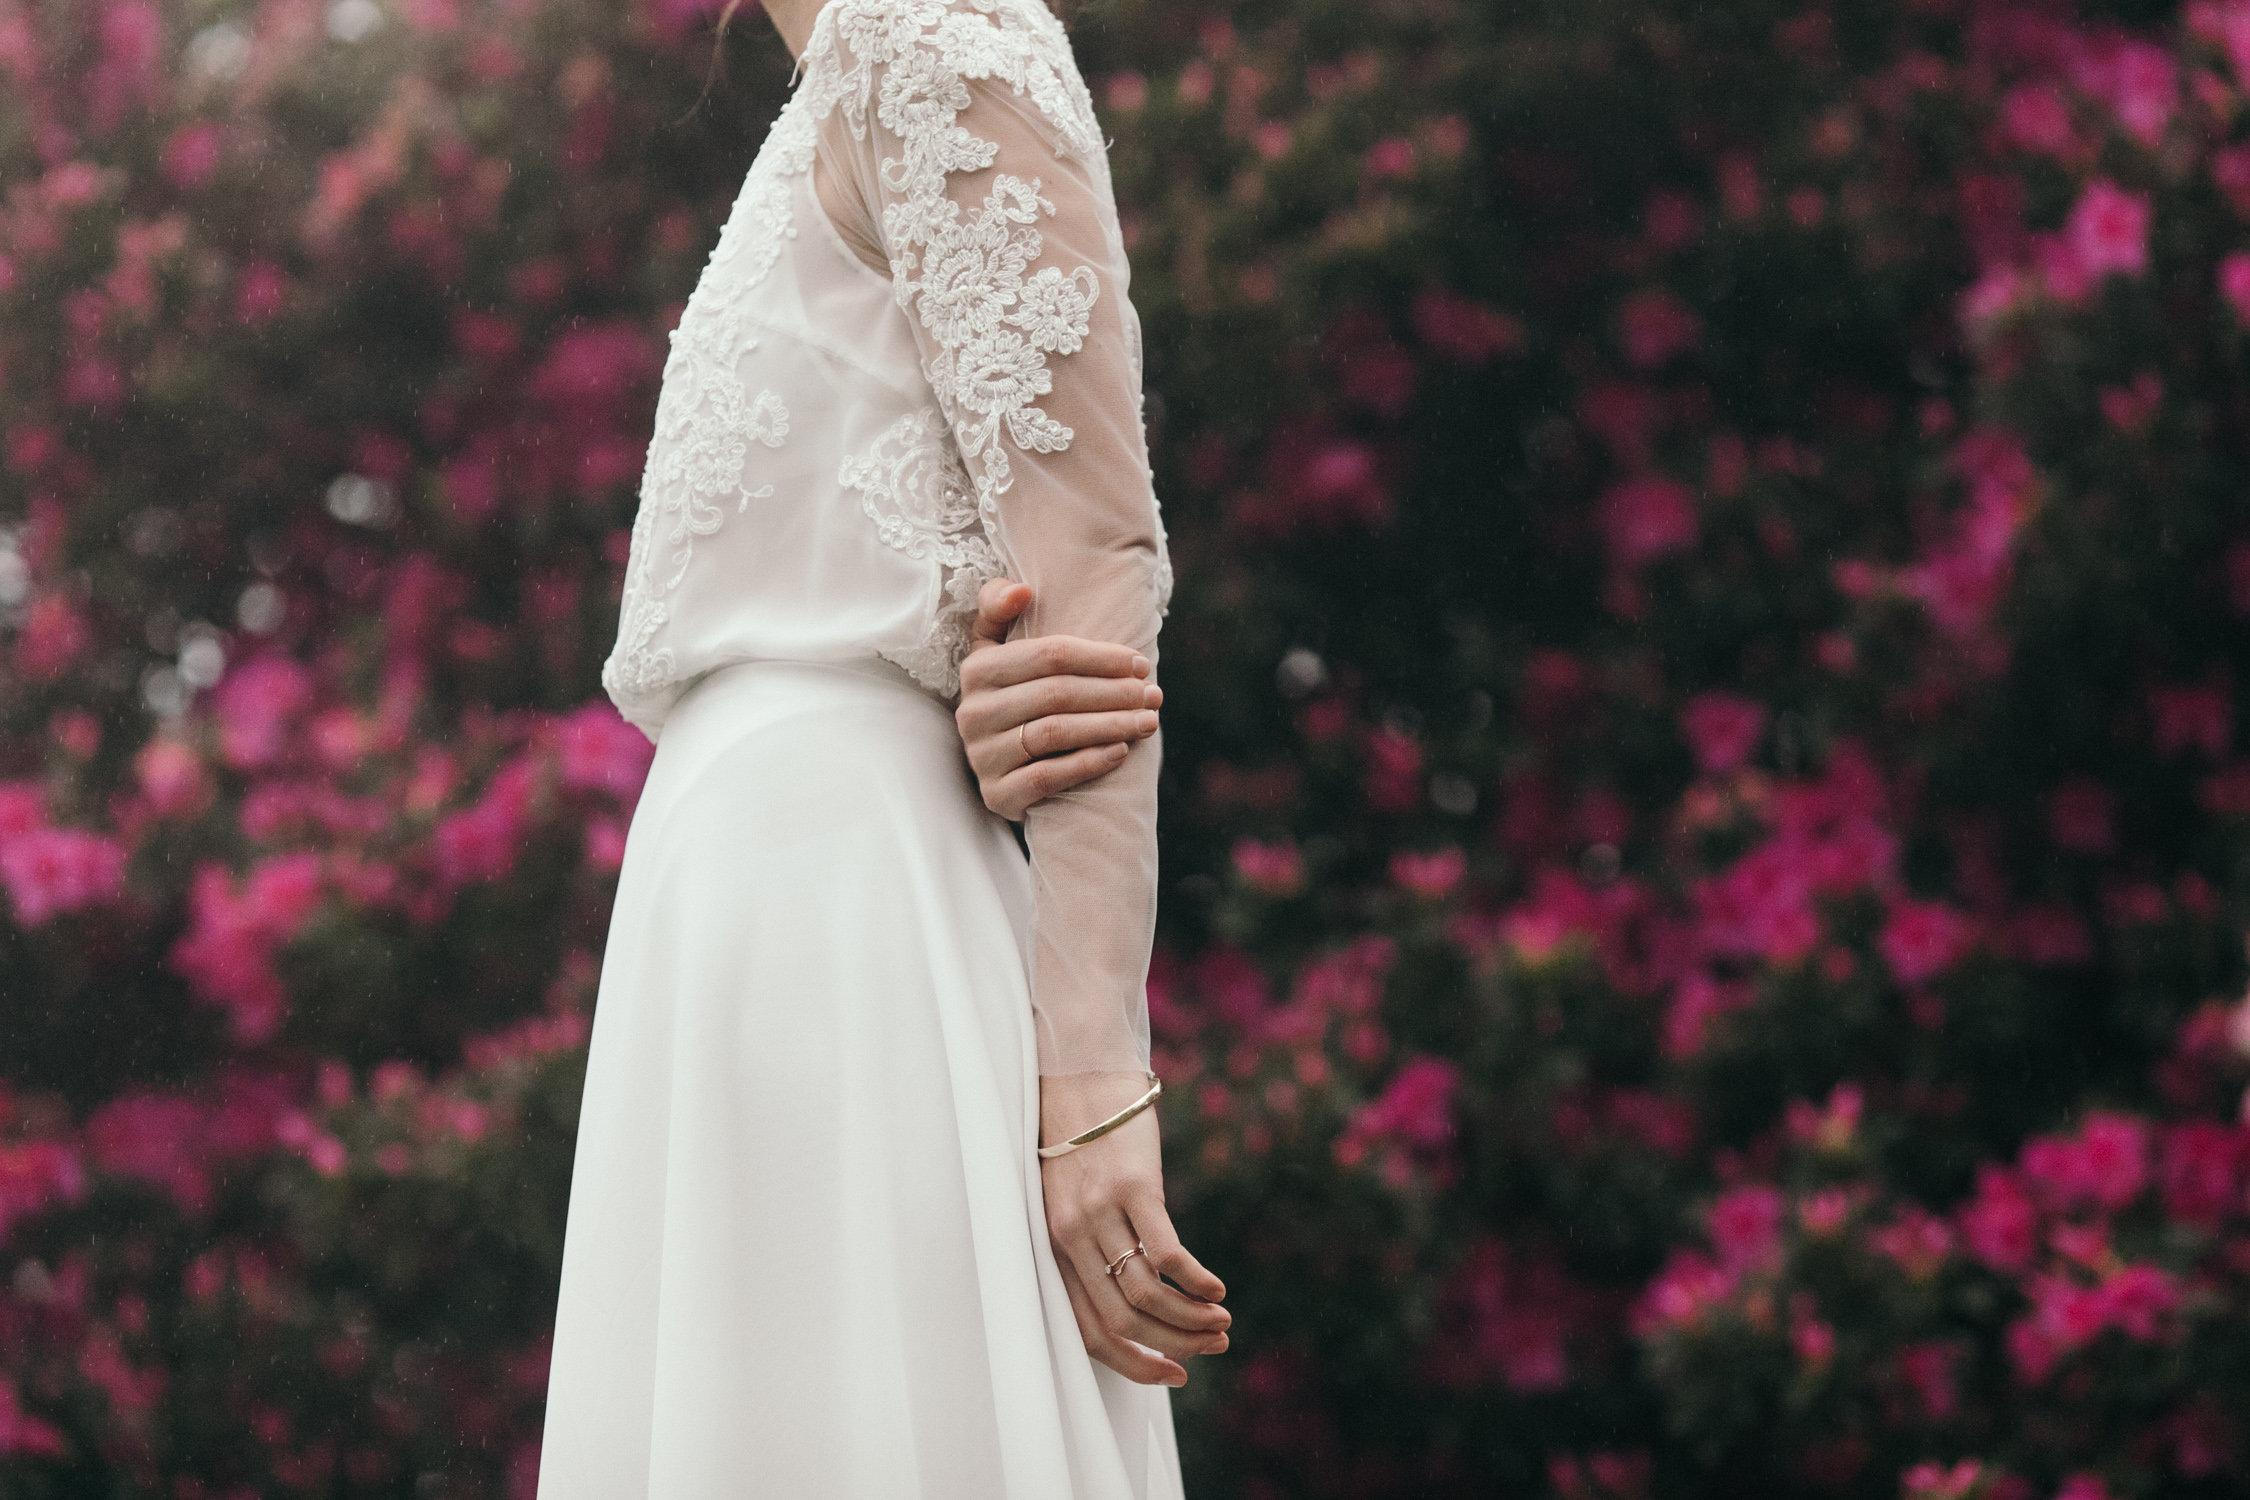 heisvisual-wedding-photographers-documentary-midlands-south-africa095.jpg